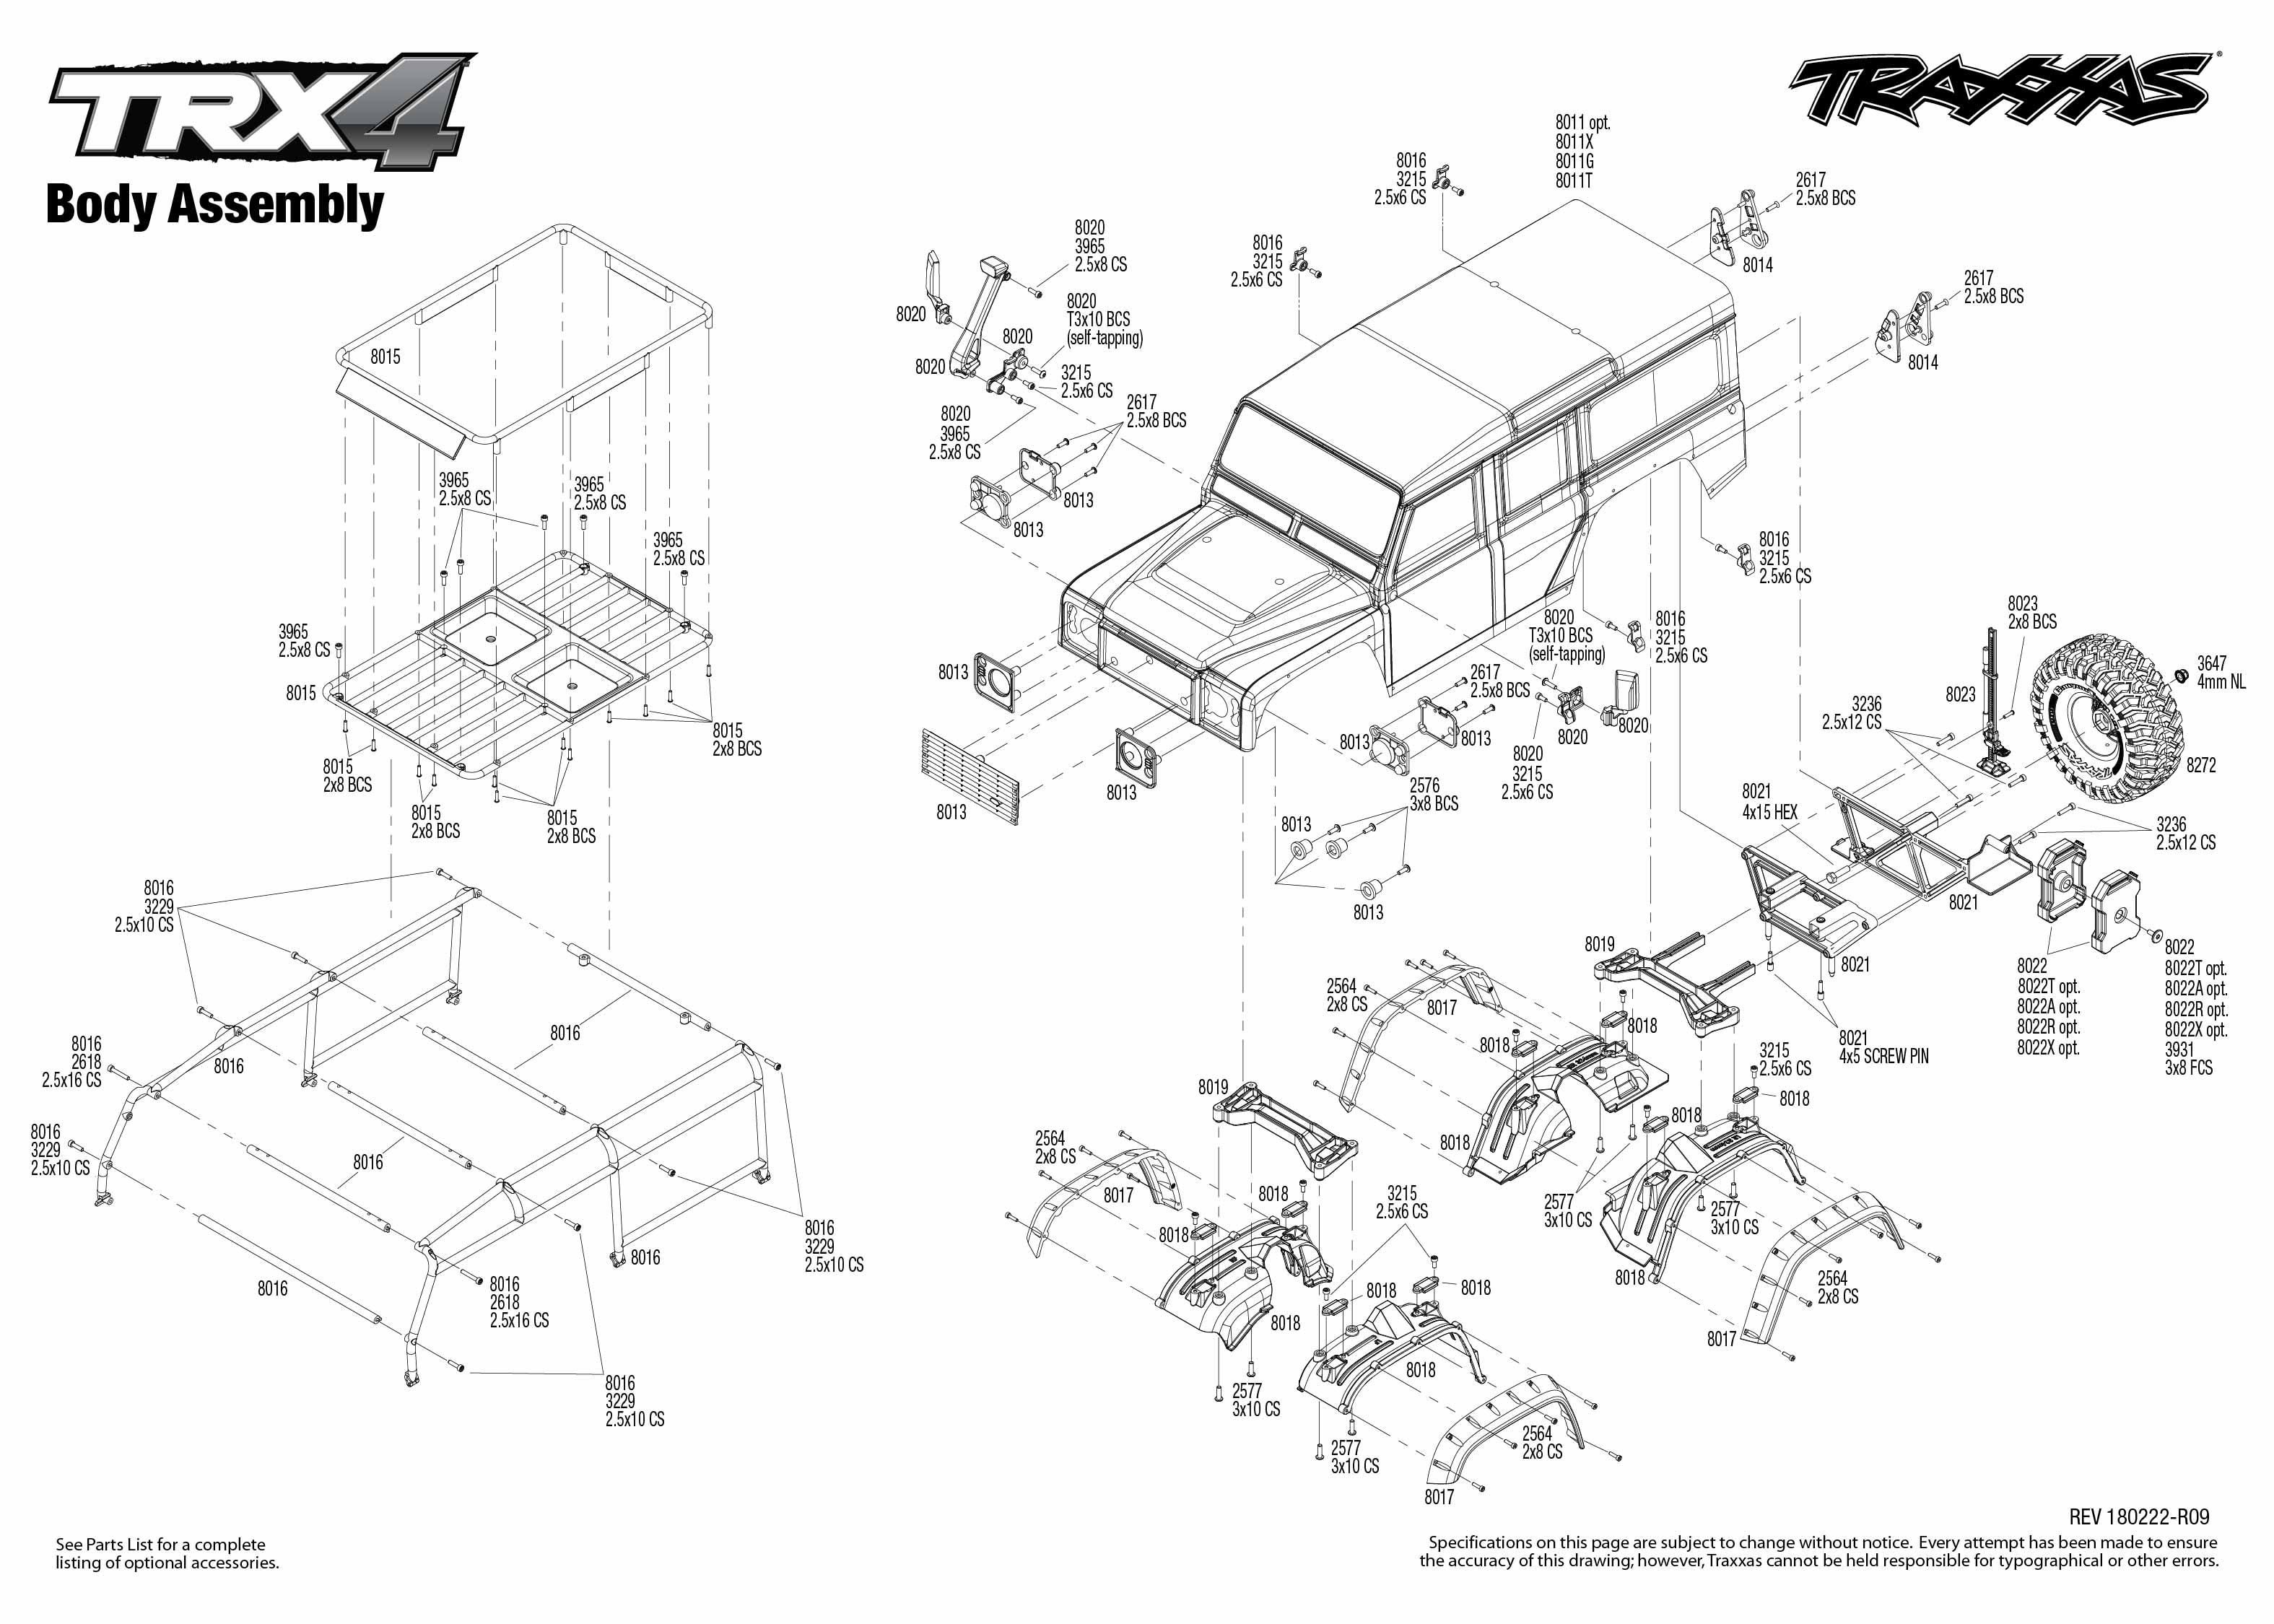 Traxxas Trx 4 Land Rover Defender Trail Crawler